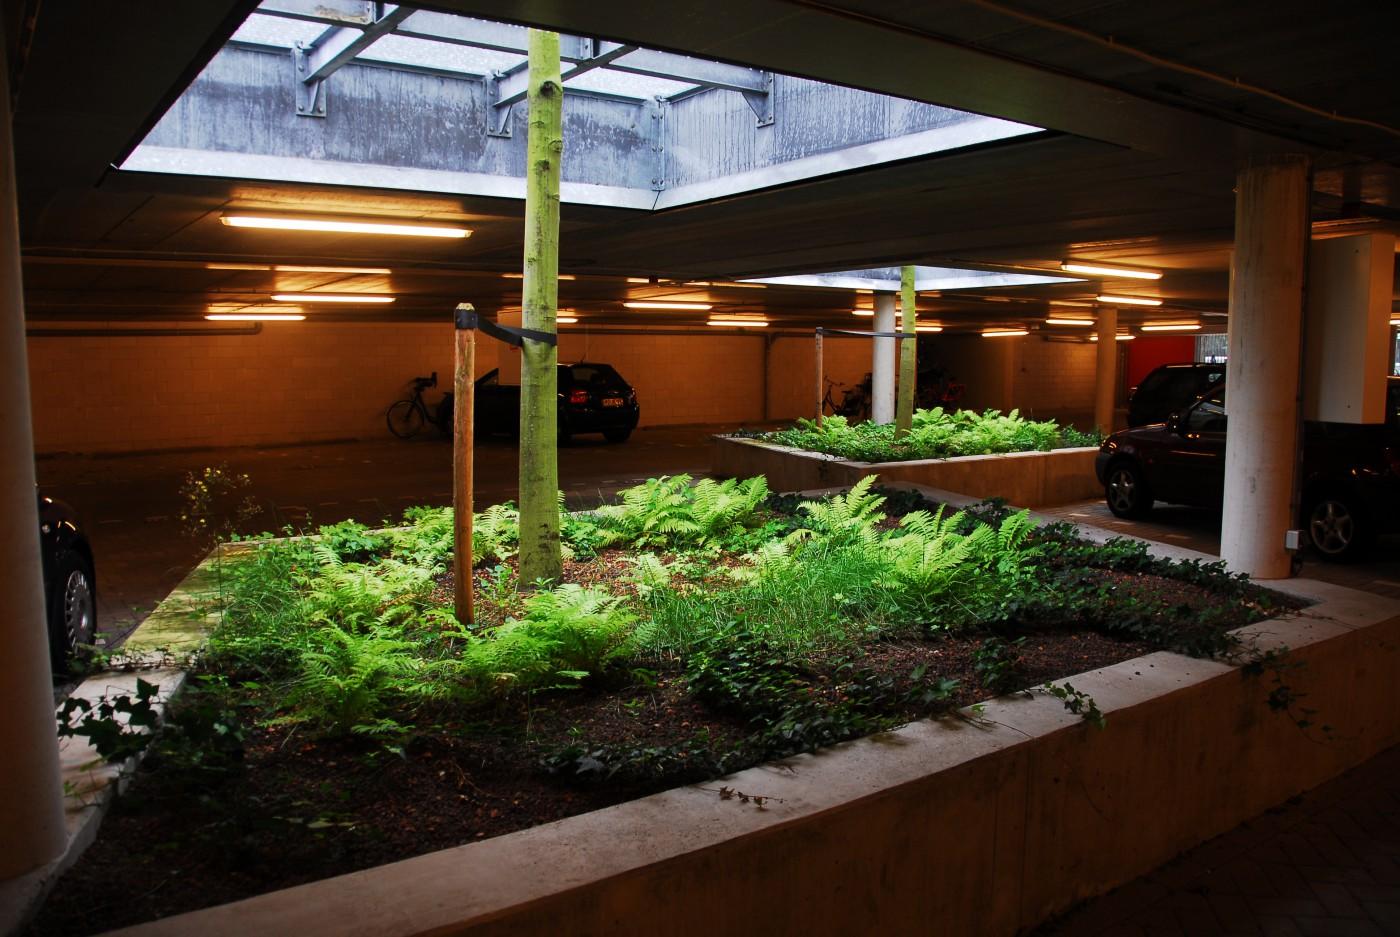 buro-sant-en-co-landschapsarchitectuur-Masira-Amsterdam-Hof-B-daktuin-noordstrook-groendak-binnentuin